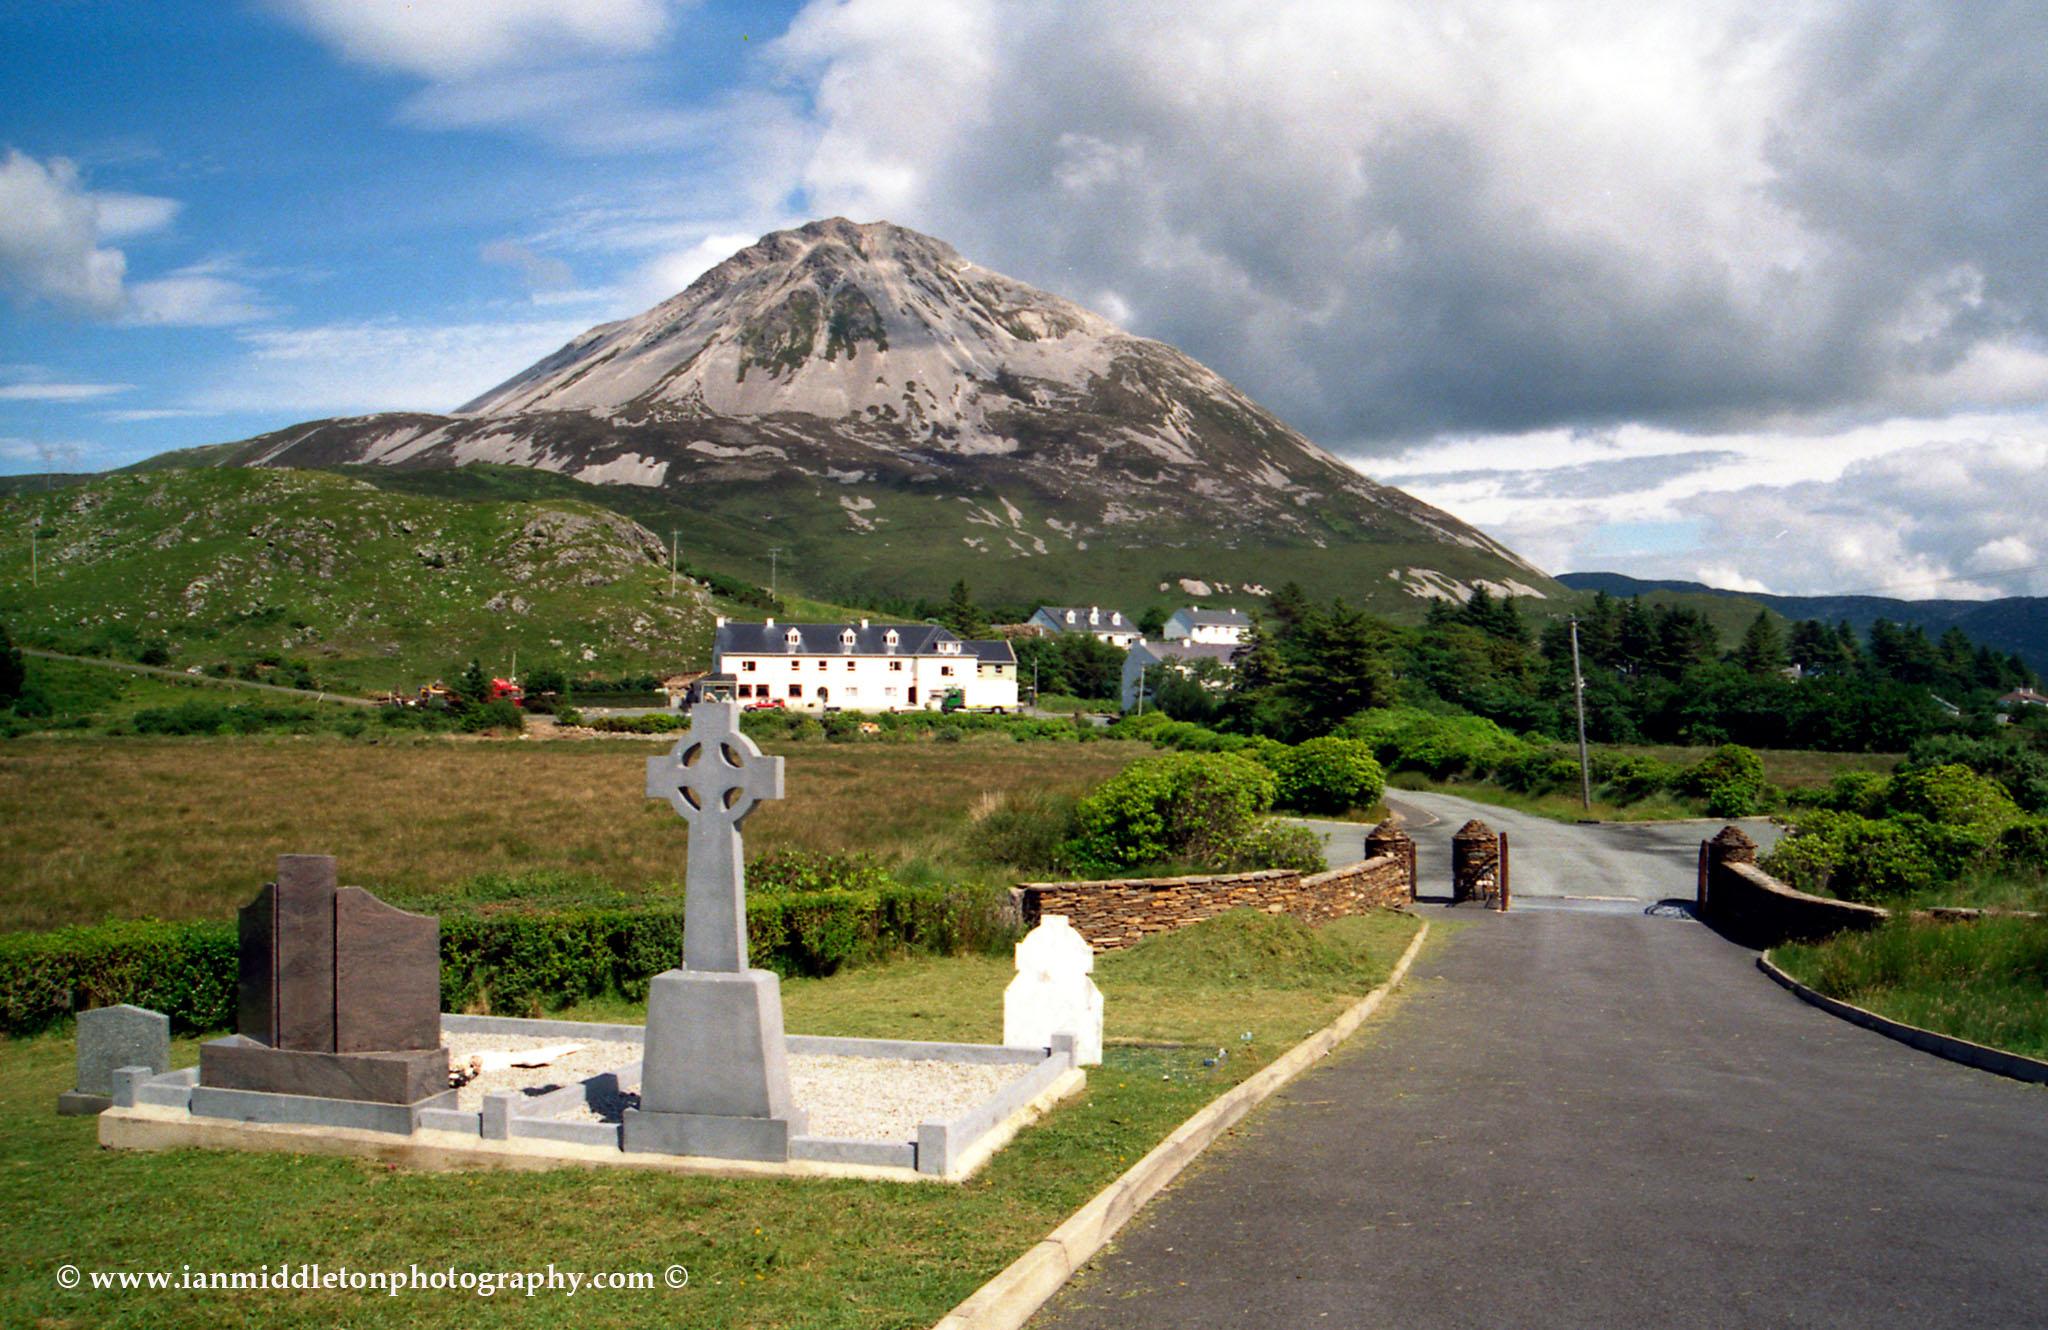 Mount Errigal in Dunlewey, Northern Donegal, Ireland.